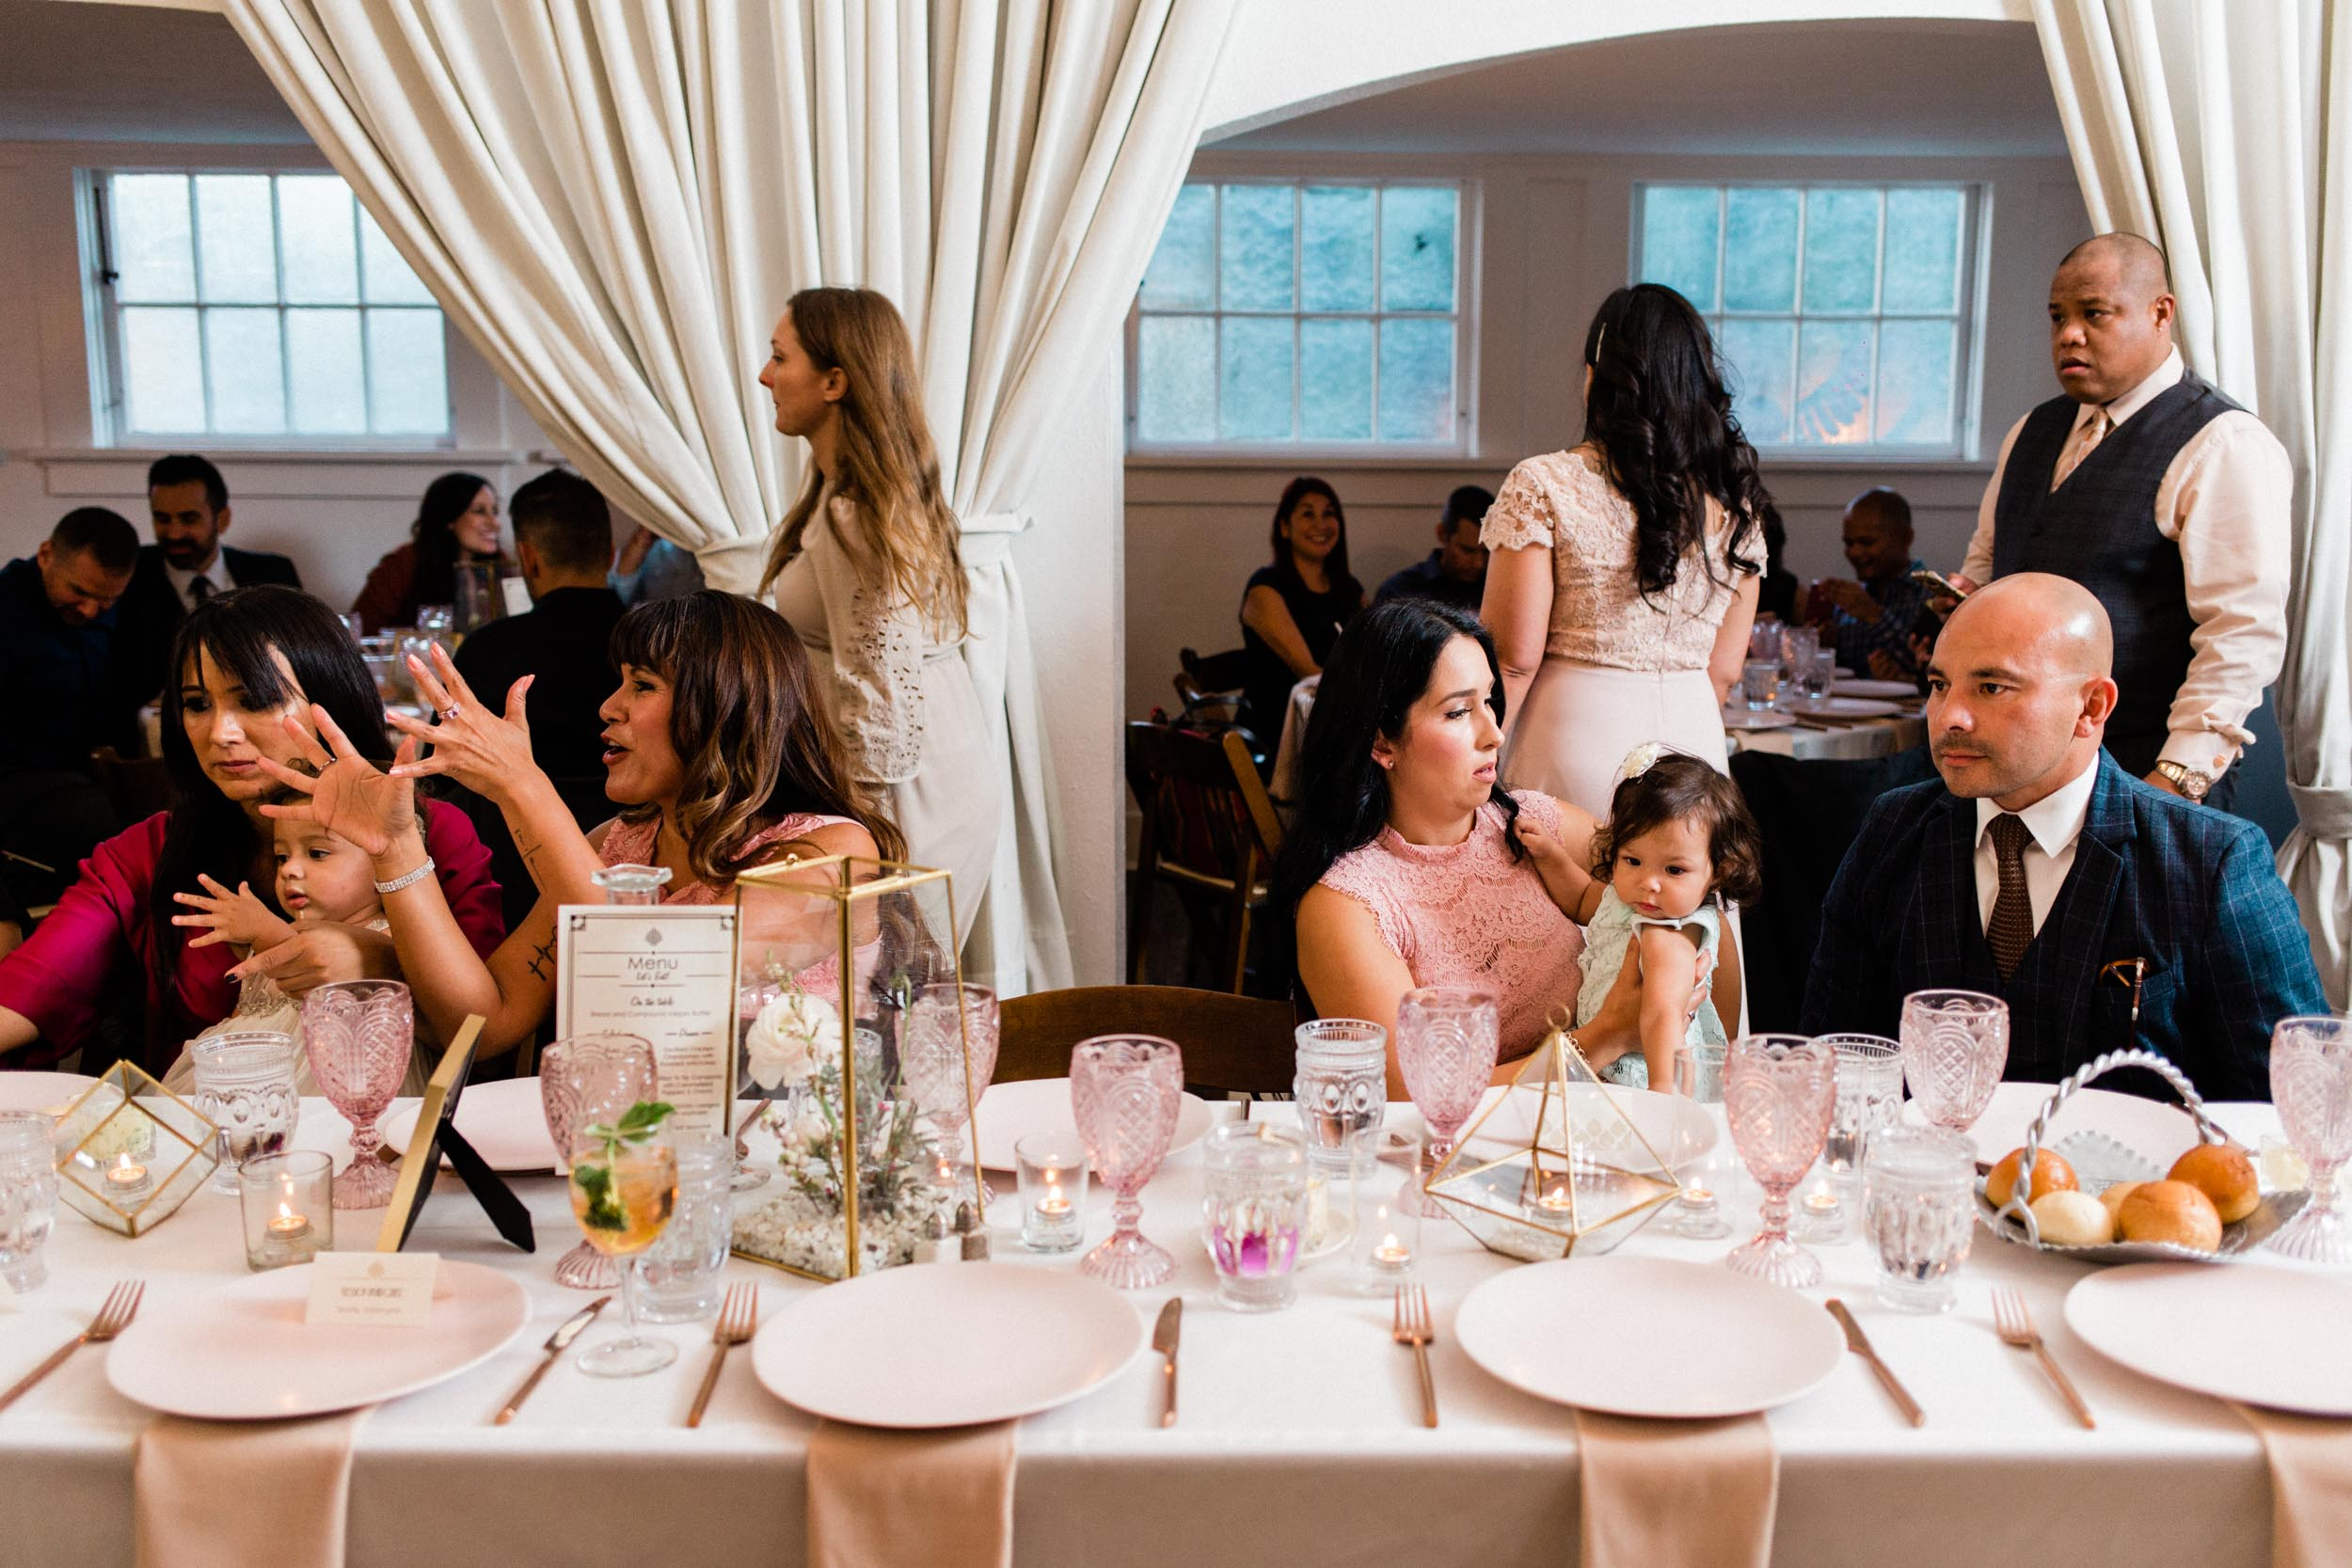 BKM-Photography-Los-Angeles-Highland-Park-York-Manor-Wedding-Photography-1100.jpg